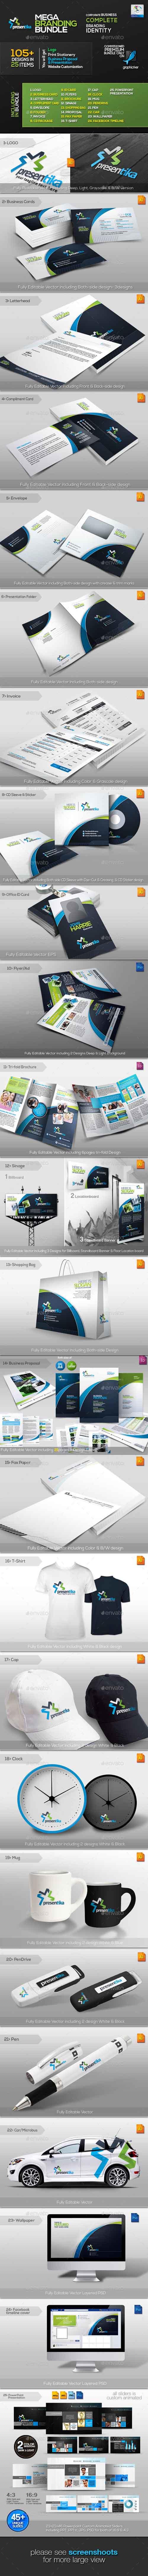 Presentica: Business Identity Mega Branding Bundle 2994870